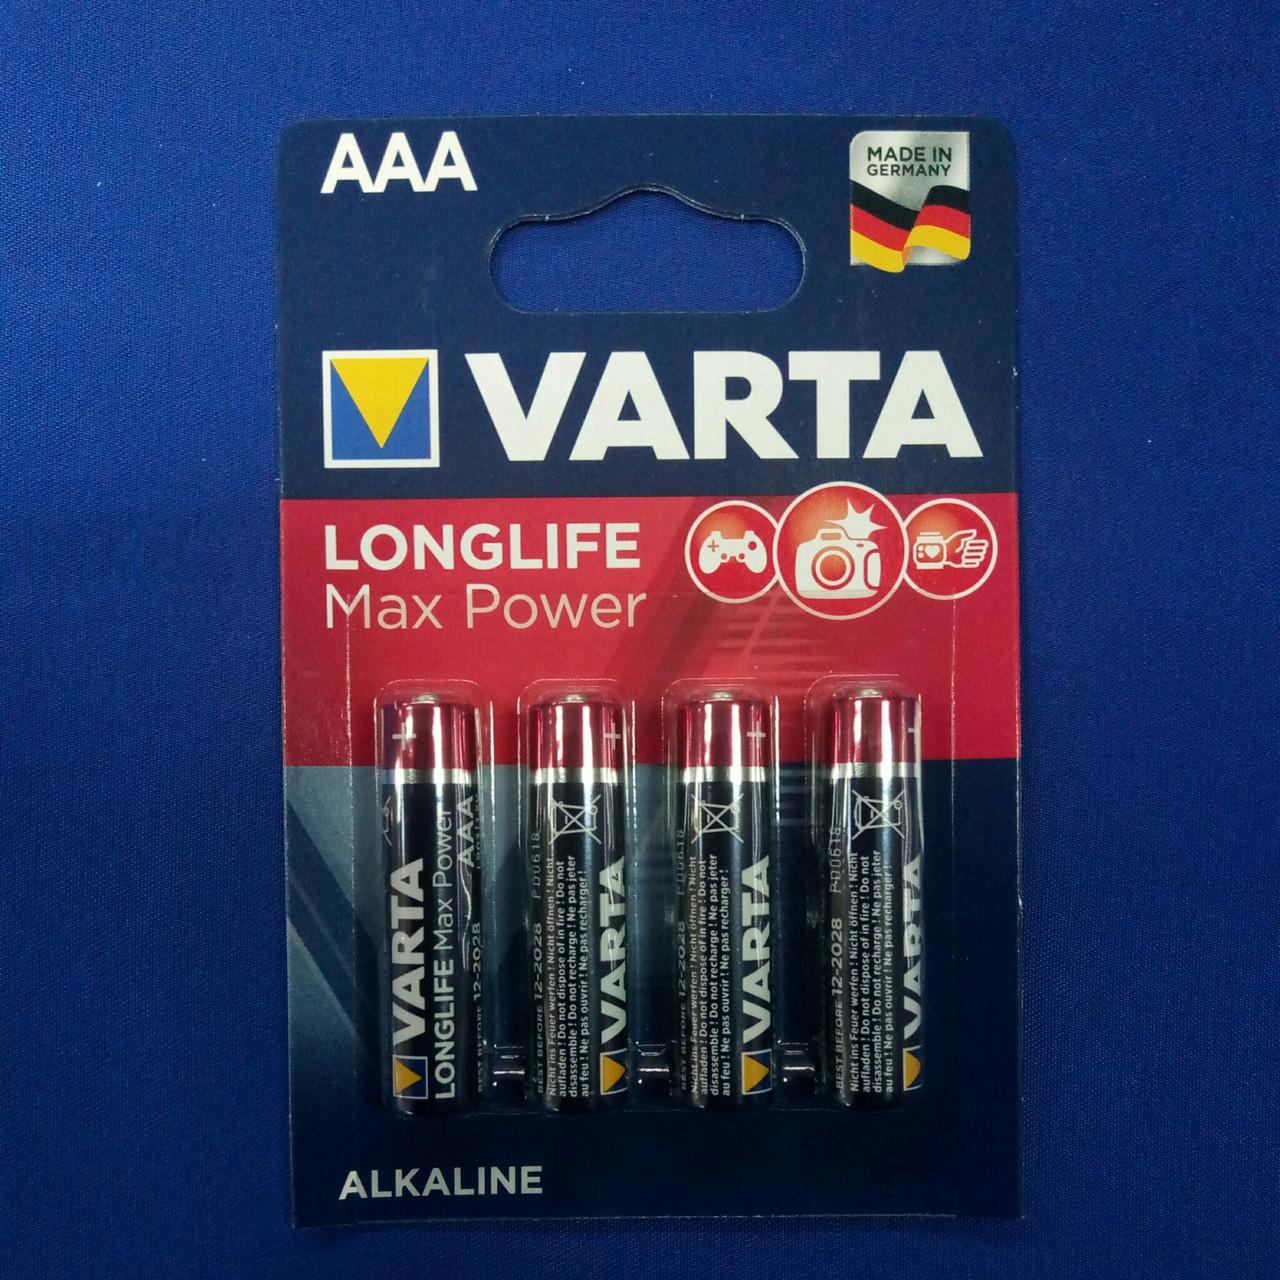 Батарейка мини-пальчиковая Varta LongLife Max Power LR03 ( 4шт. )